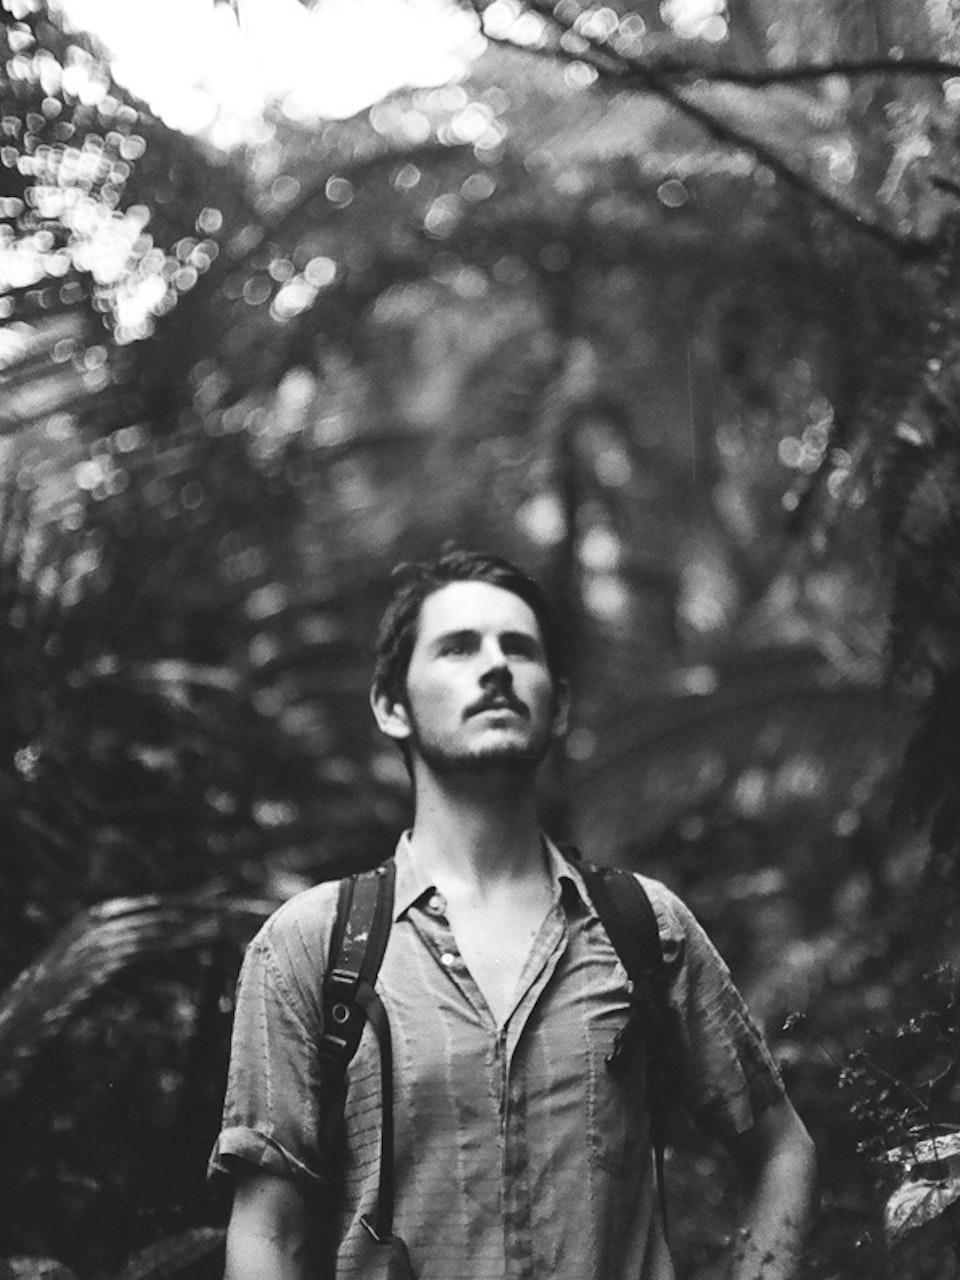 Black and White Film - El Yunque National Rainforest, Rio Grande, Puerto Rico